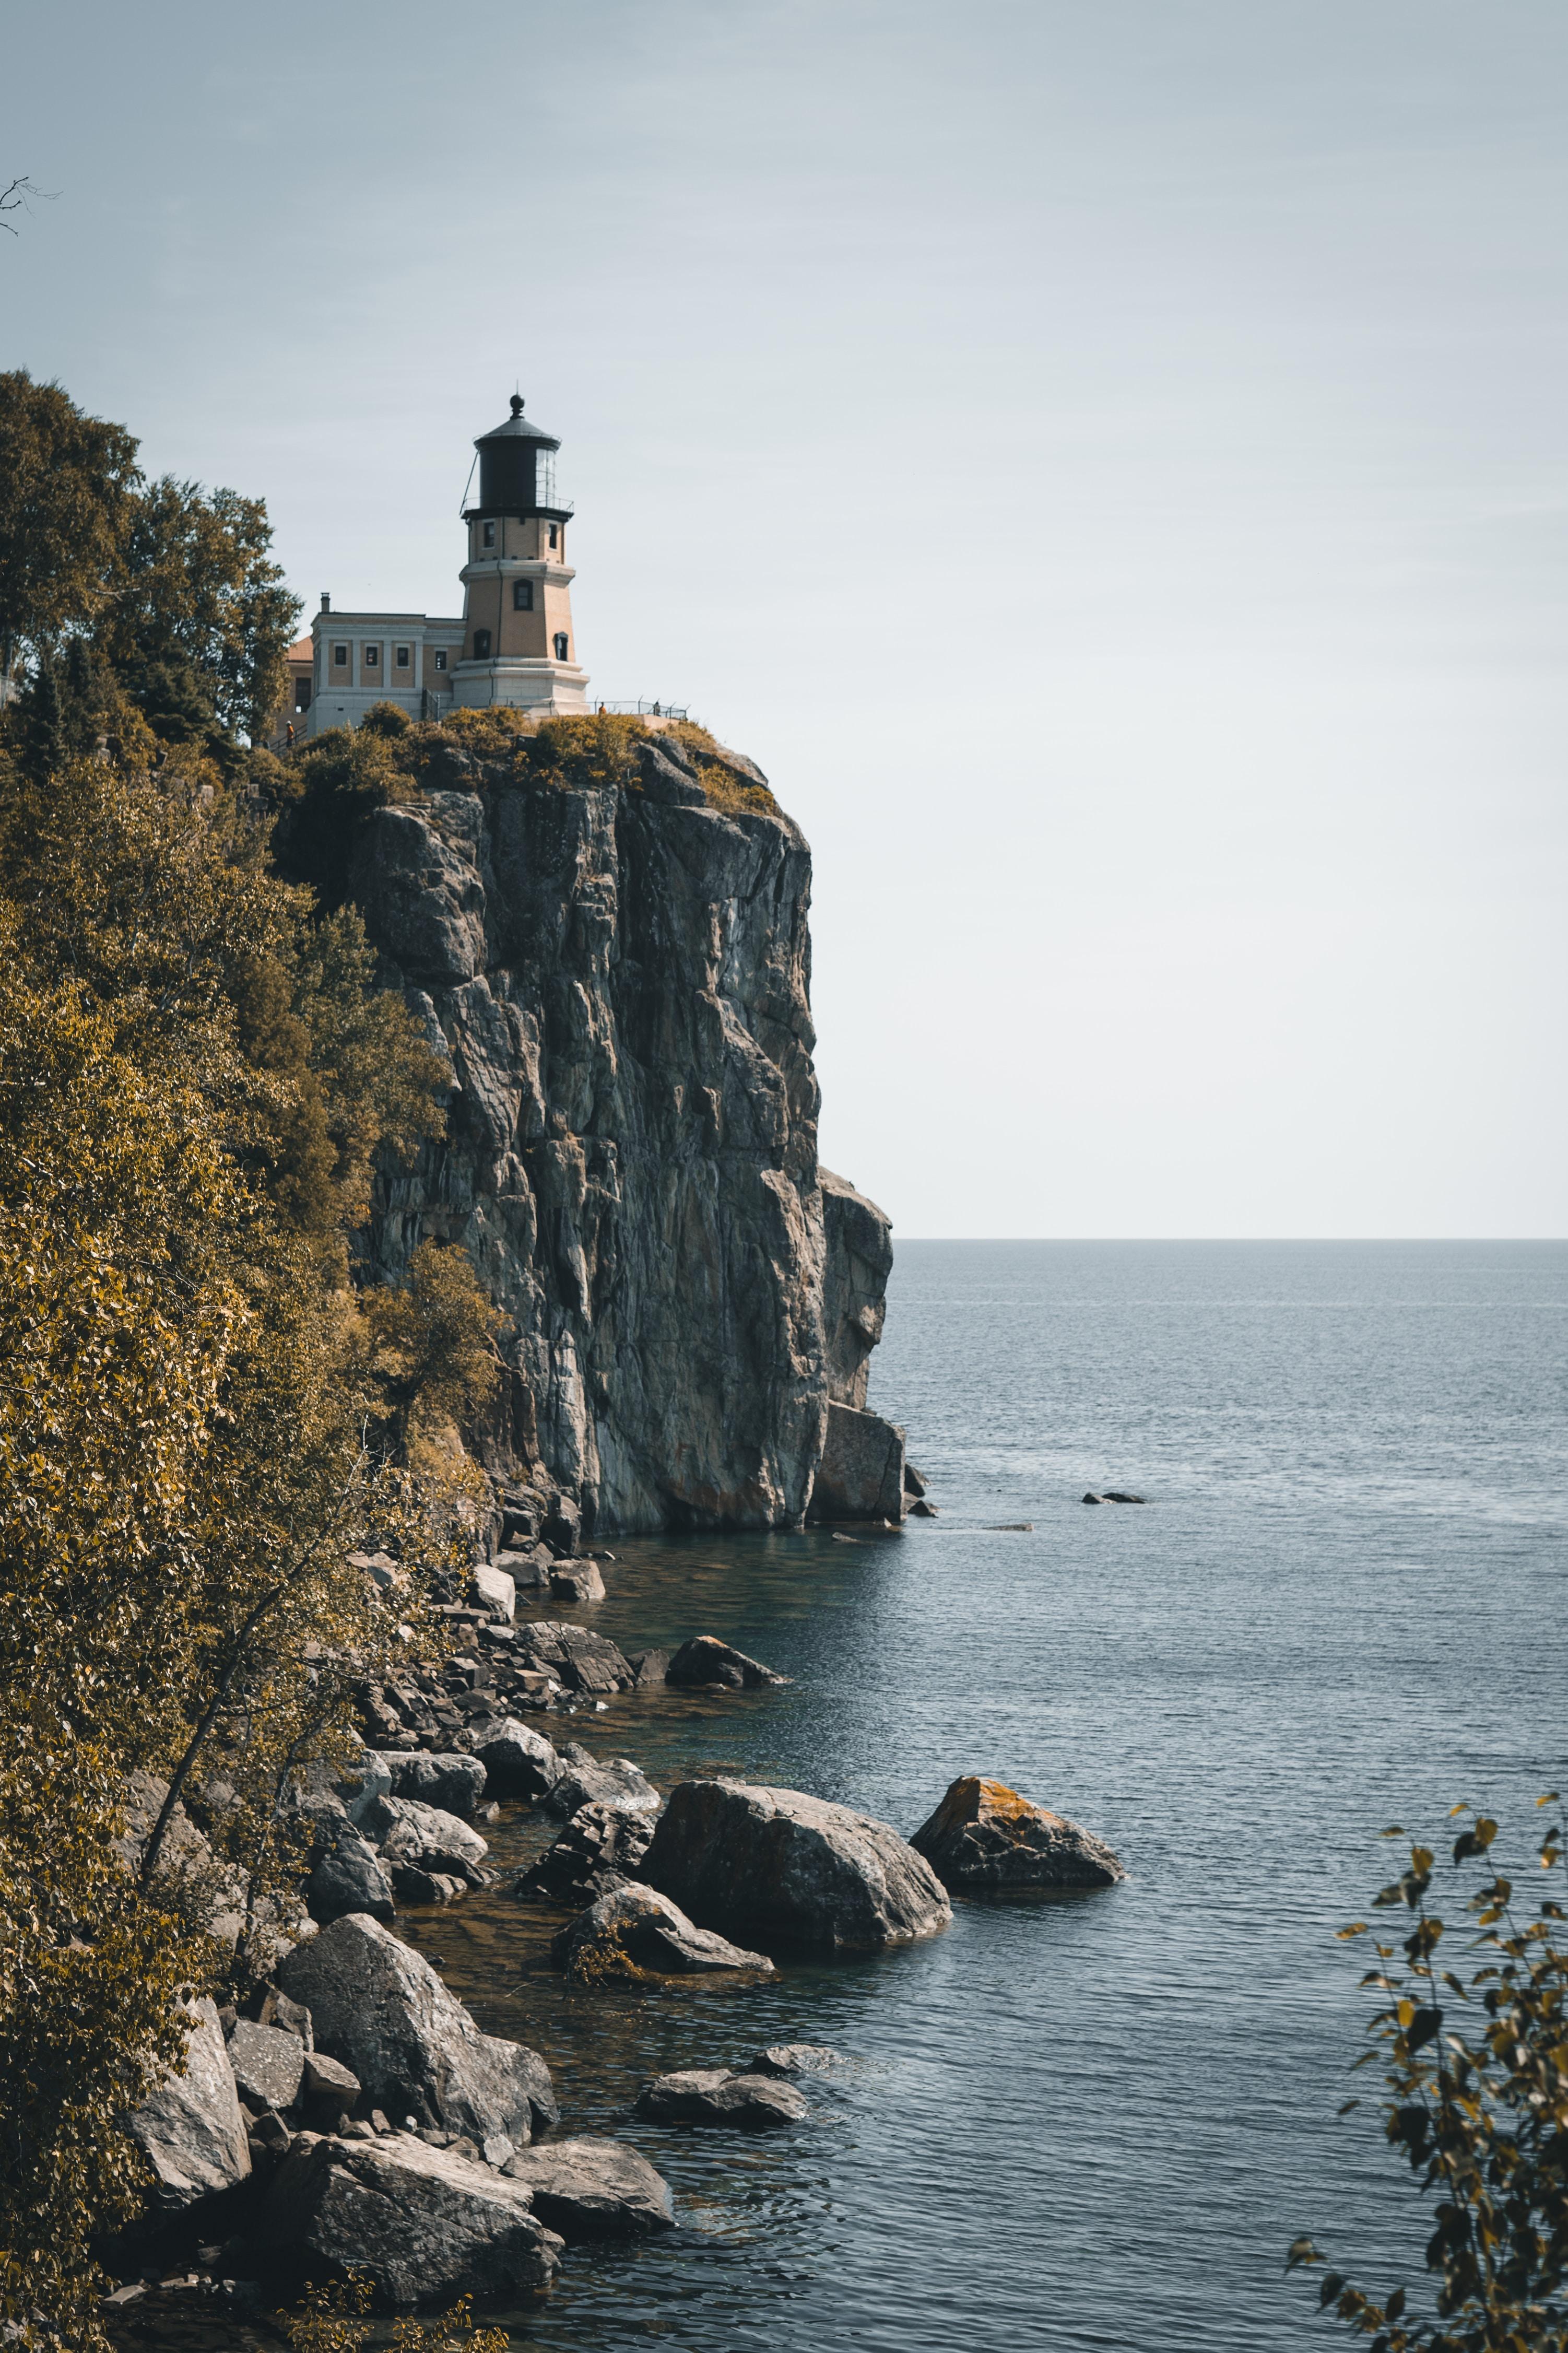 lighthouse above cliff near seashore